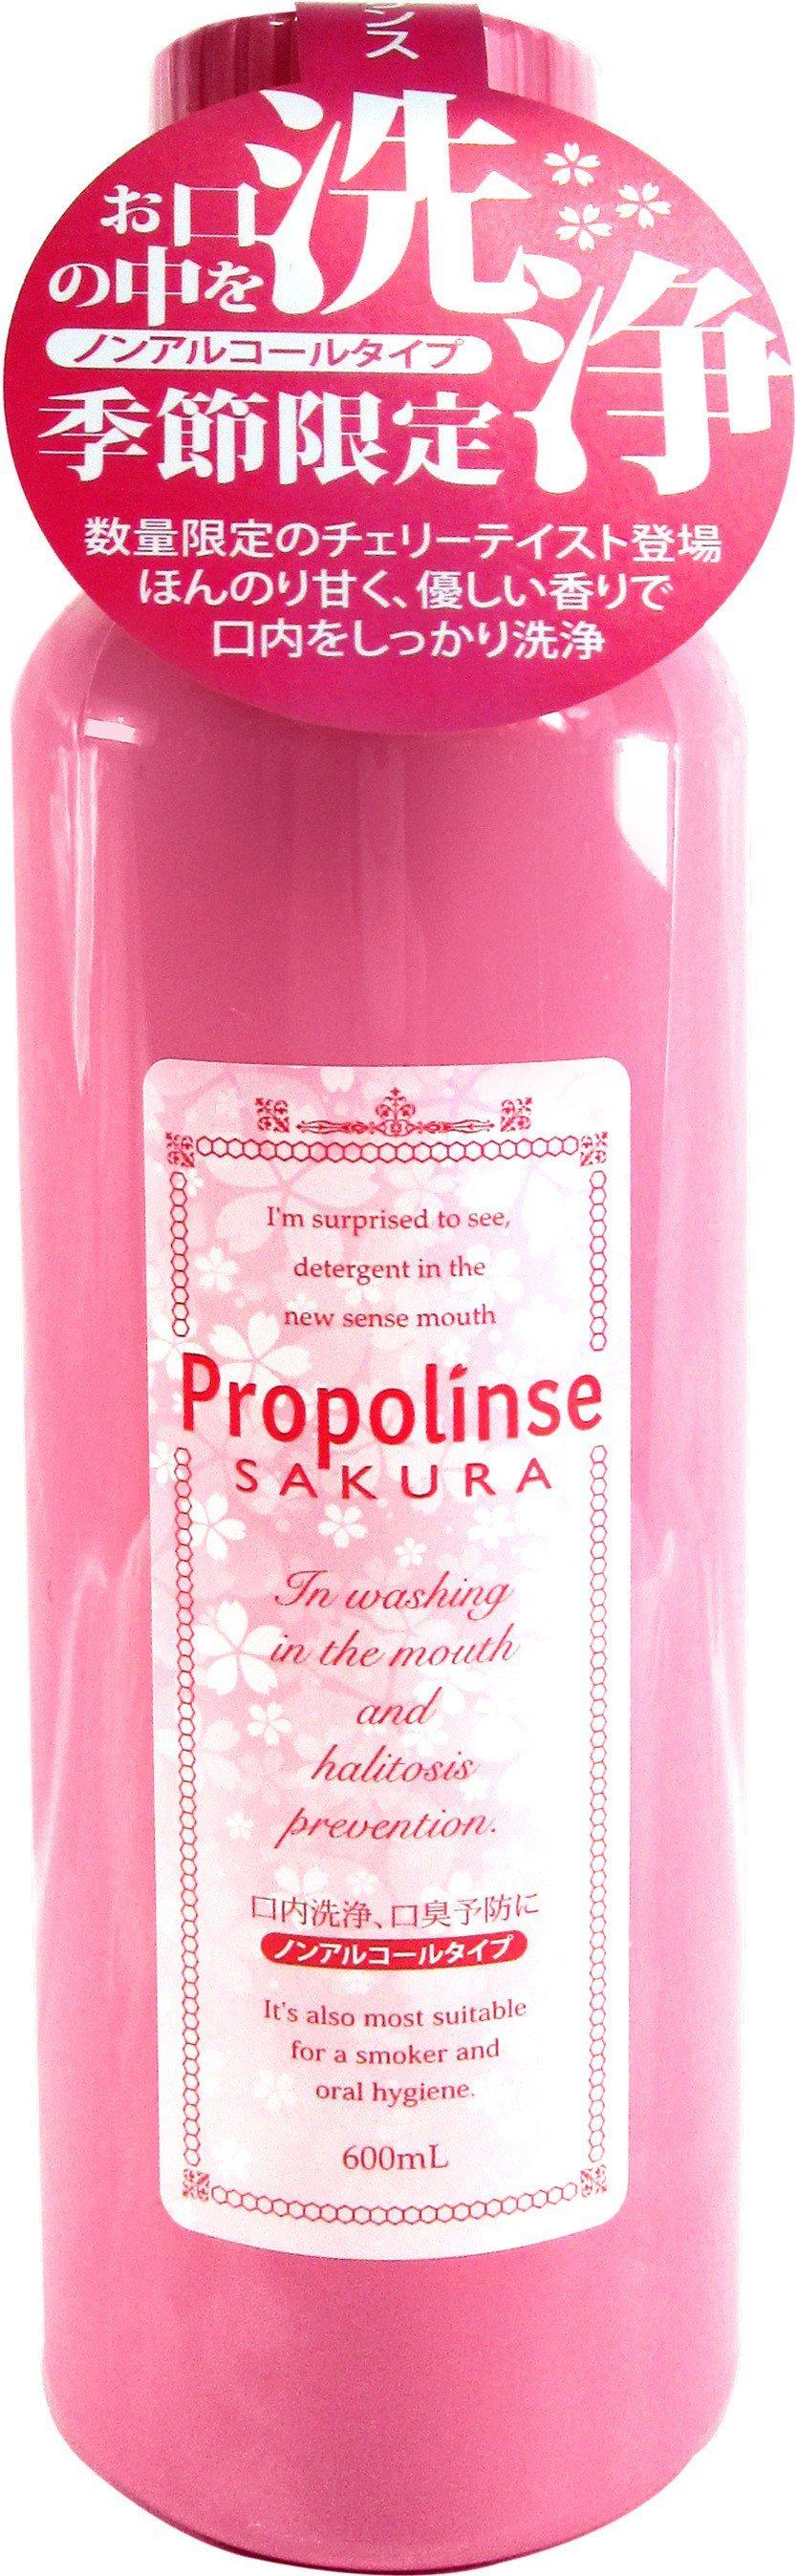 Propolinse櫻花漱口水,600ml售價460元。圖/松本清提供